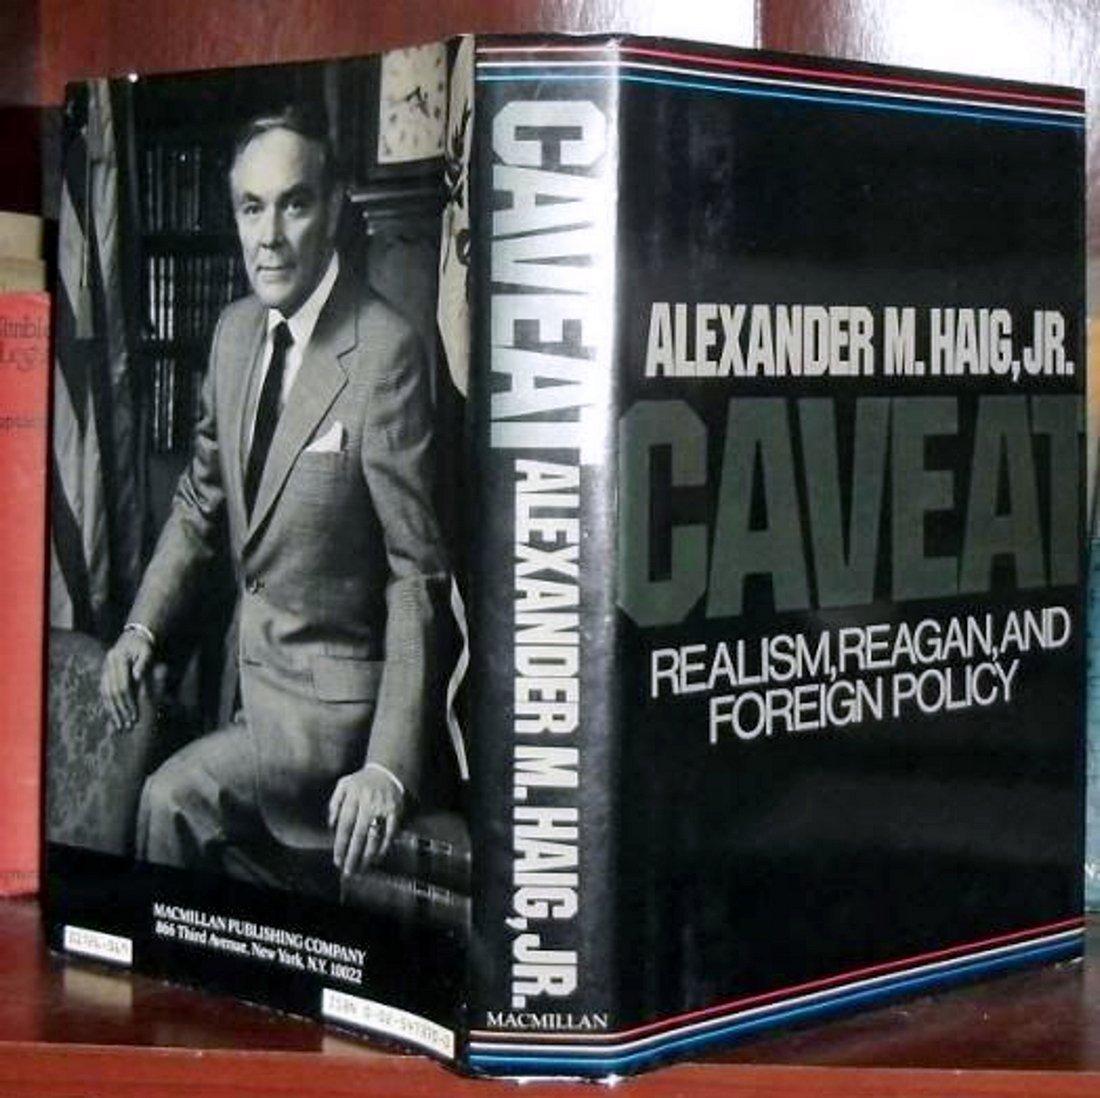 Alexander M. Haig Jr: Caveat, Signed 1st Edition